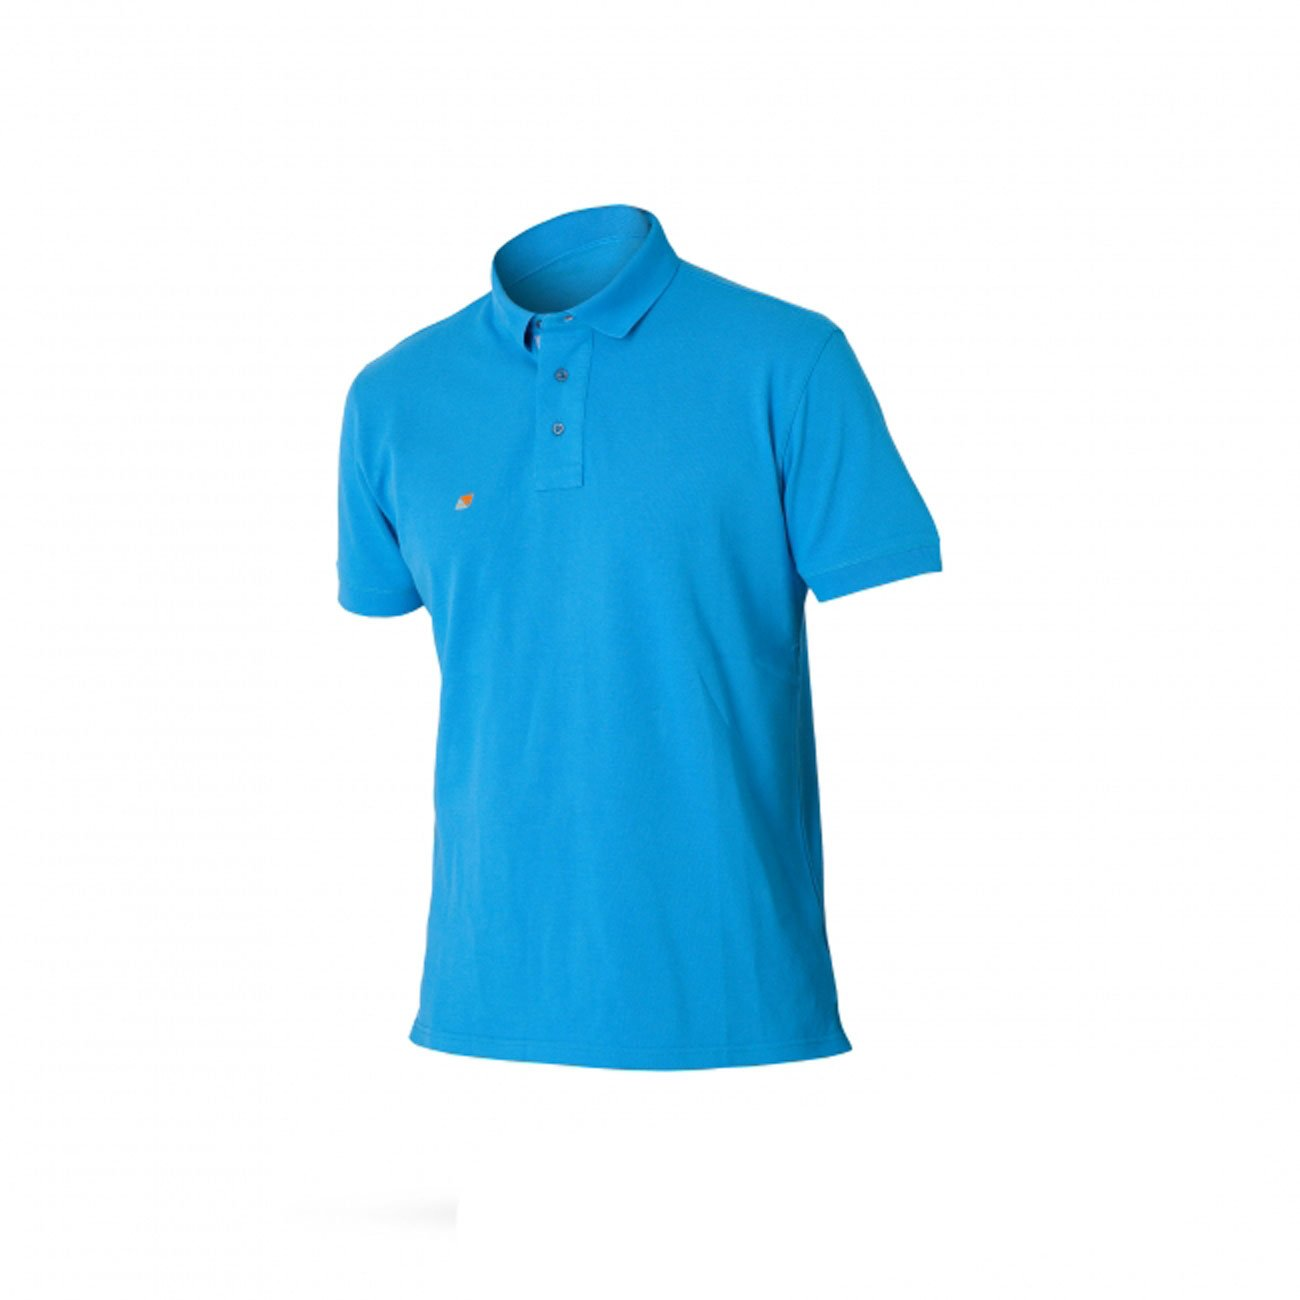 Magic Marine Herren Squall Poloshirt Kurzarm, Farbe Blau, Größe XXXL   Amazon.de  Sport   Freizeit ab59d482e3